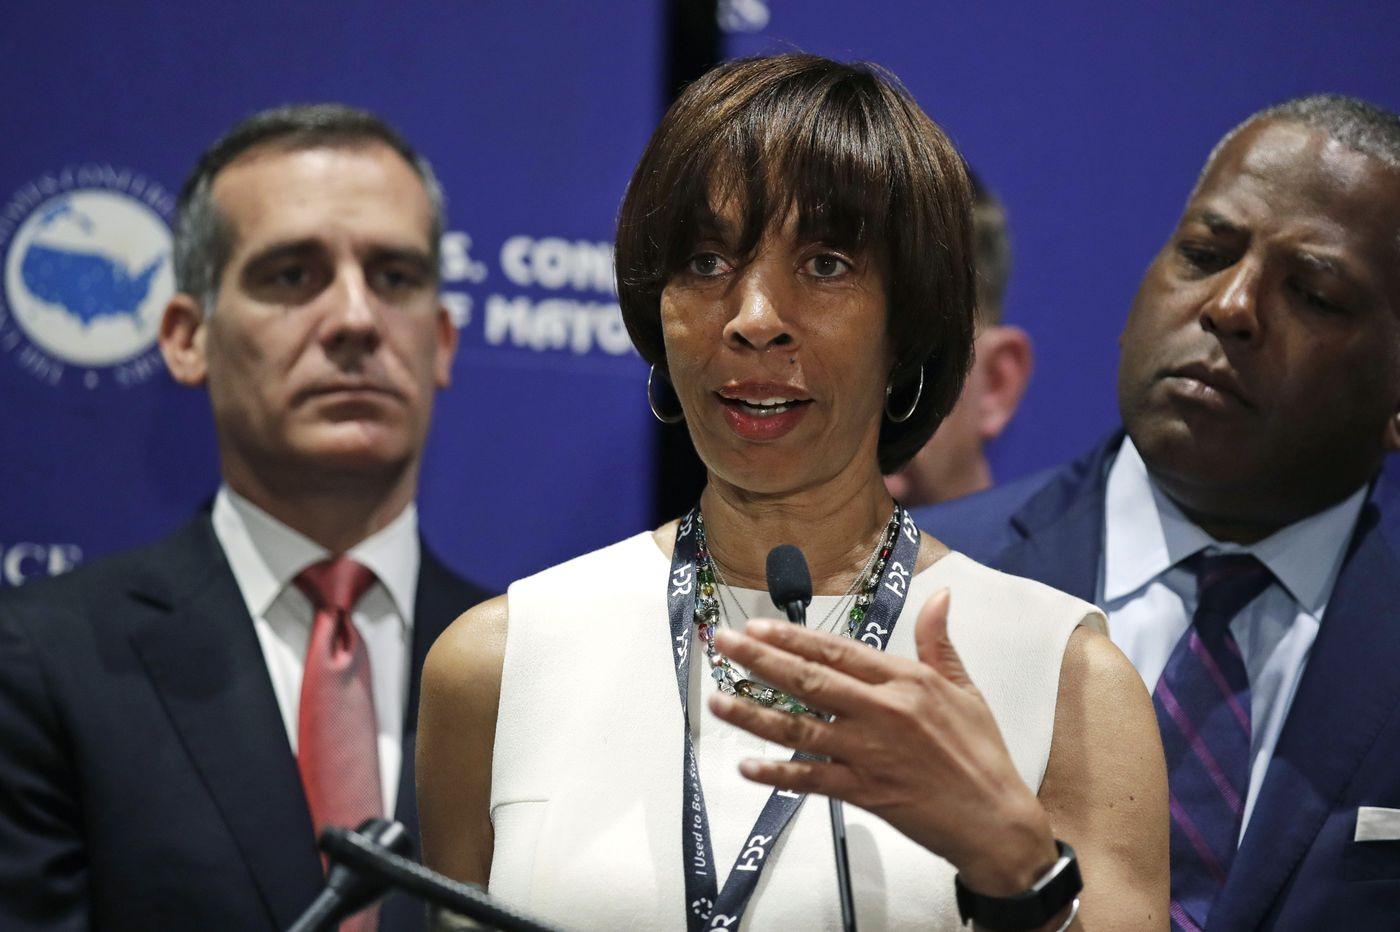 Baltimore mayor's $500K book deal draws intense criticism